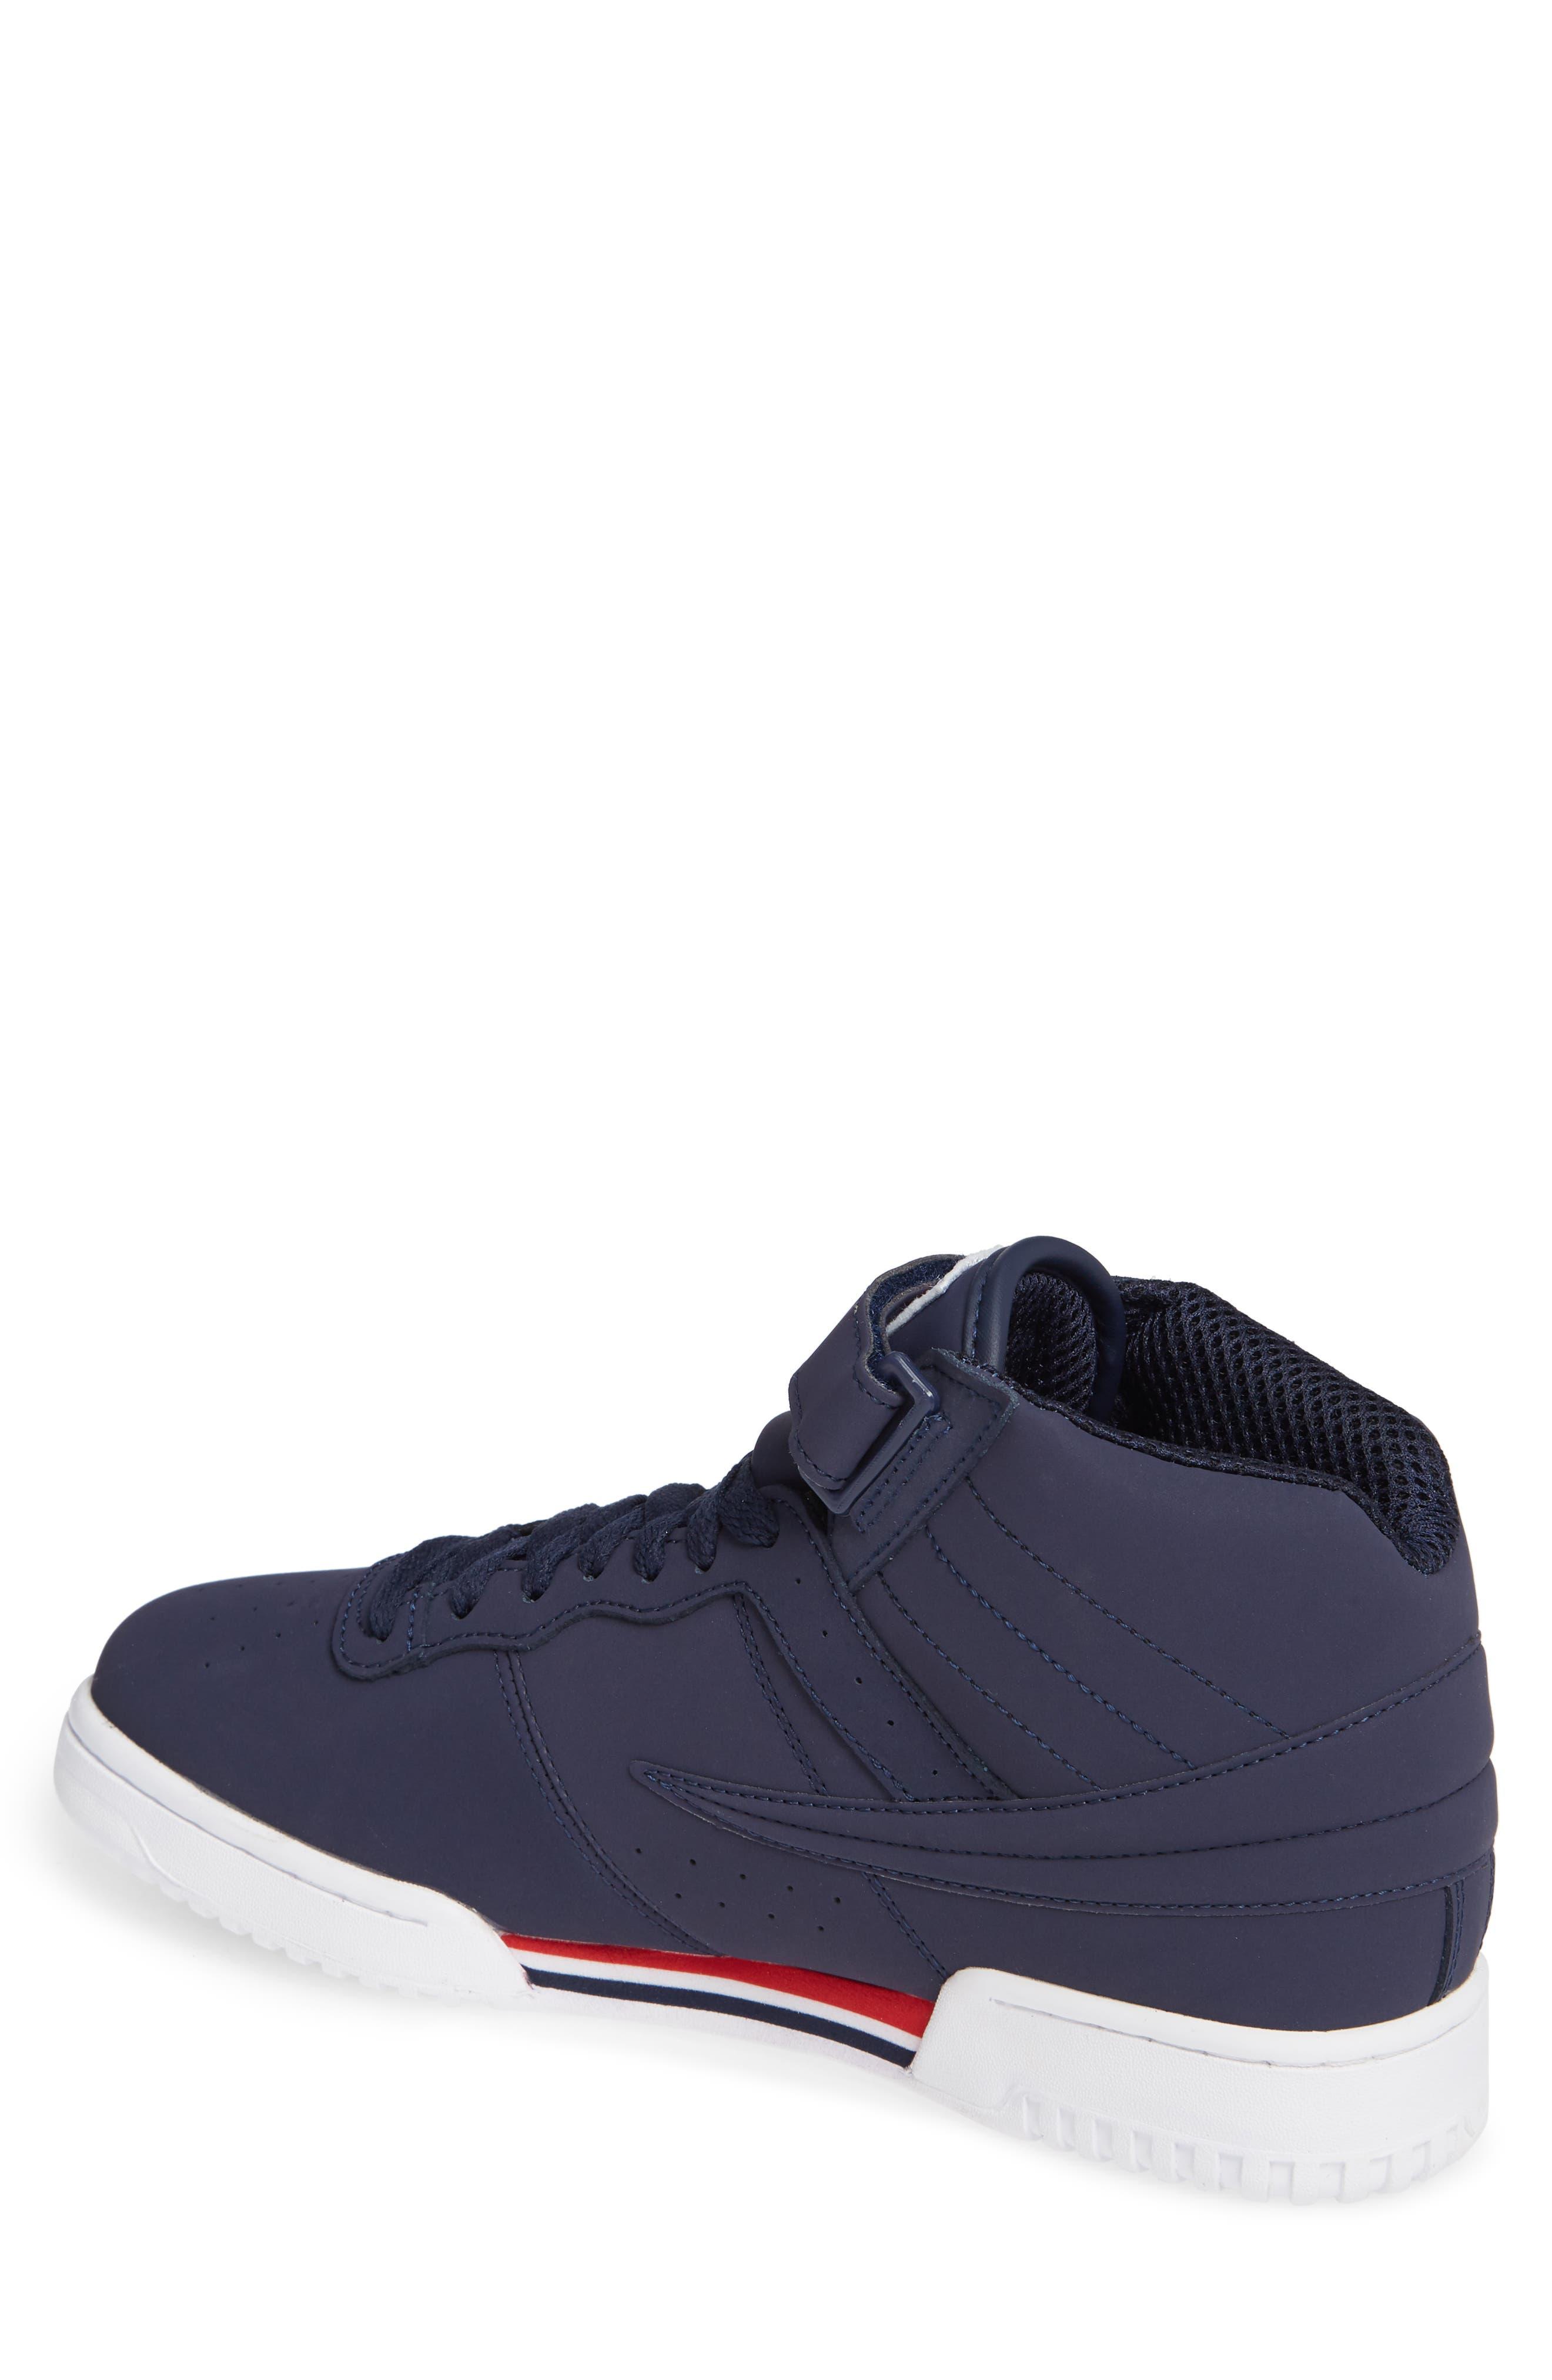 F-13 F-Box Sneaker,                             Alternate thumbnail 2, color,                             NAVY/ WHITE/ RED